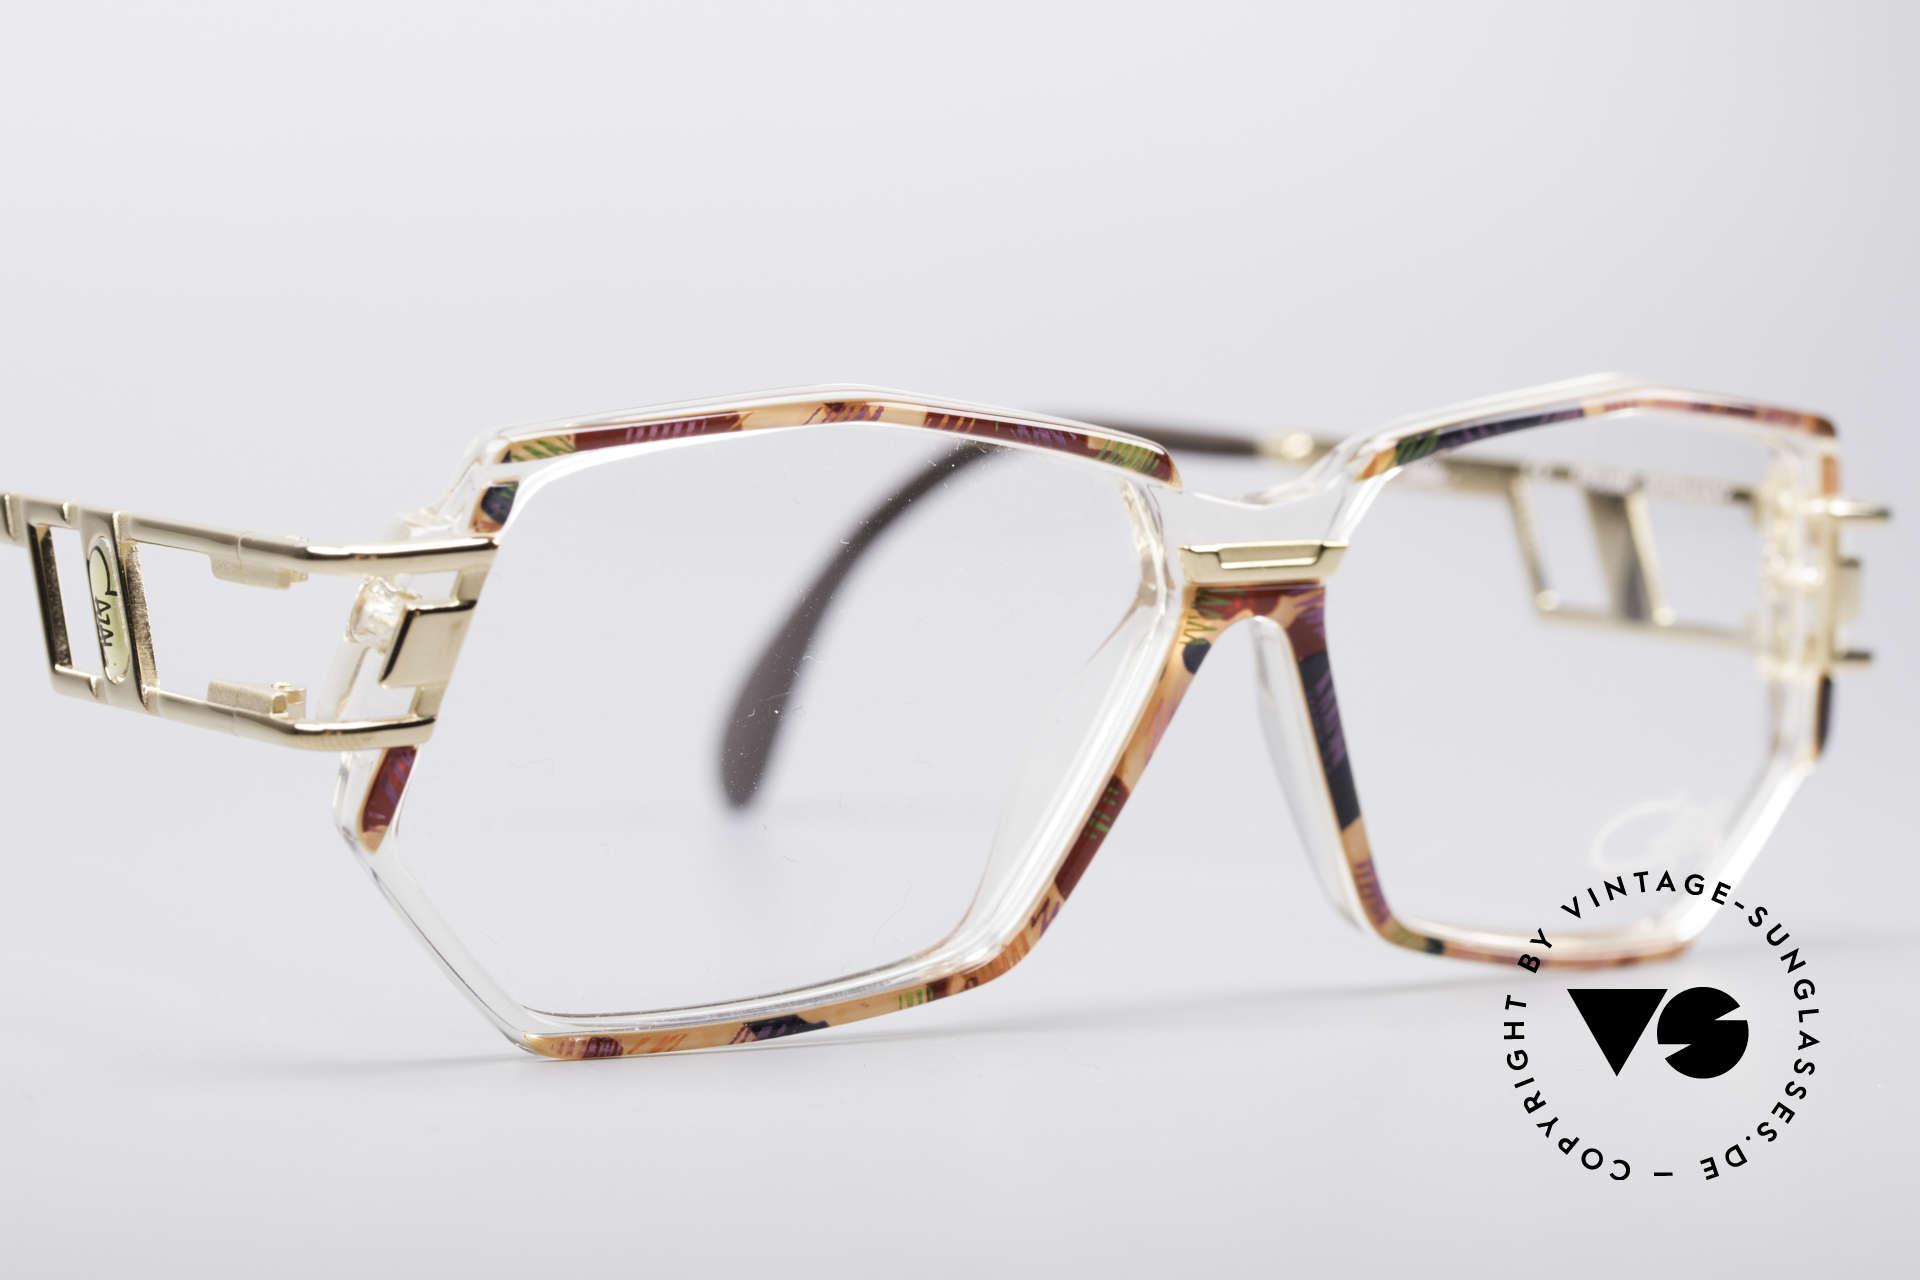 Cazal 359 90's Hip Hop Eyeglasses, NO RETRO EYEGLASSES, but an old original from 1993, Made for Women